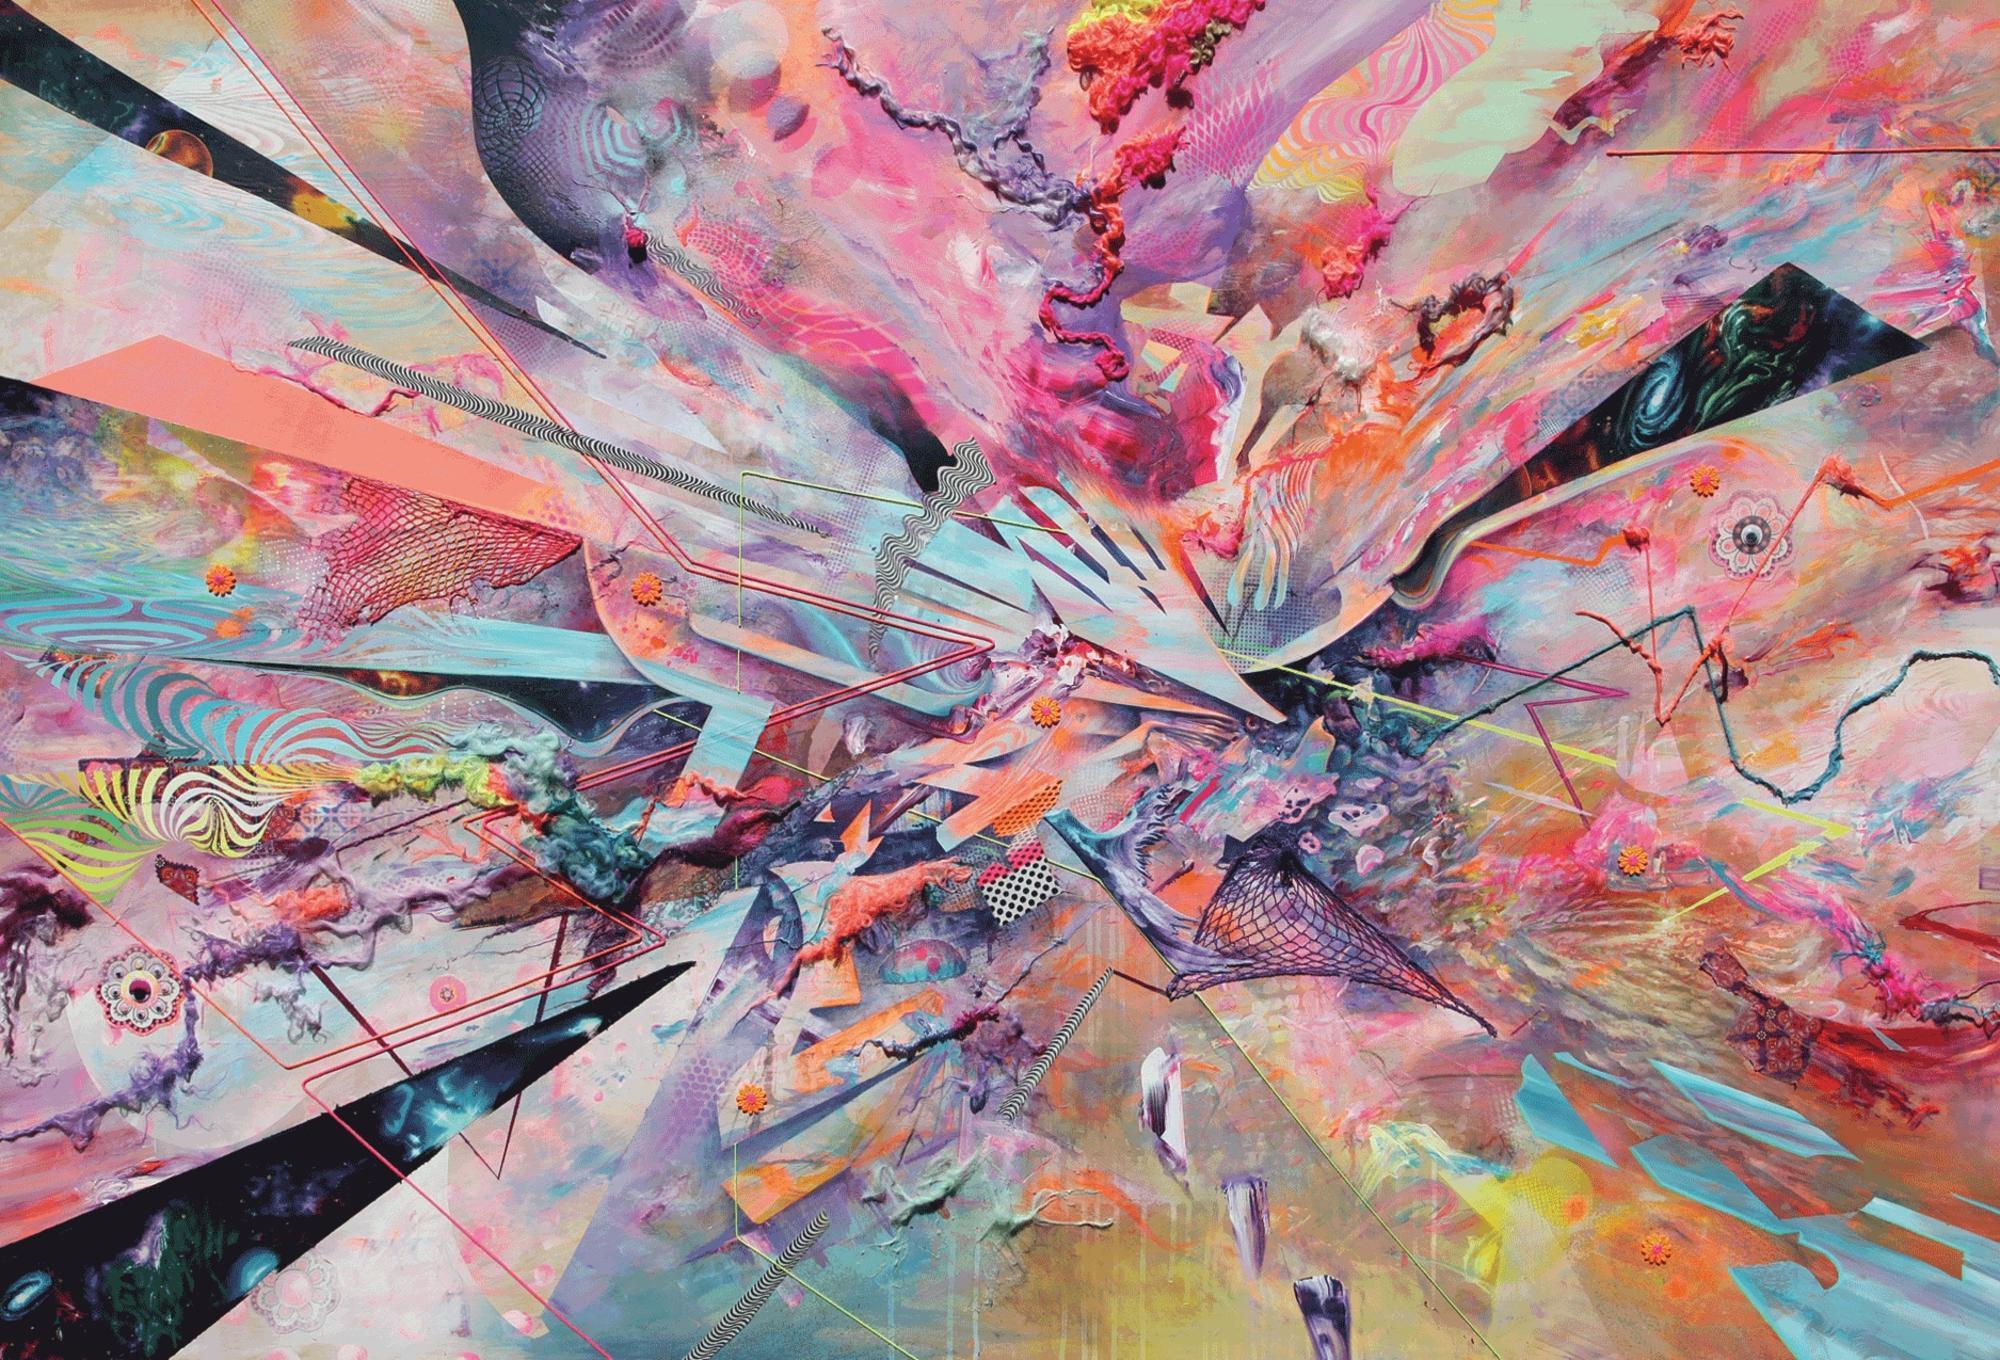 Sparkles Positron + Damon Soule